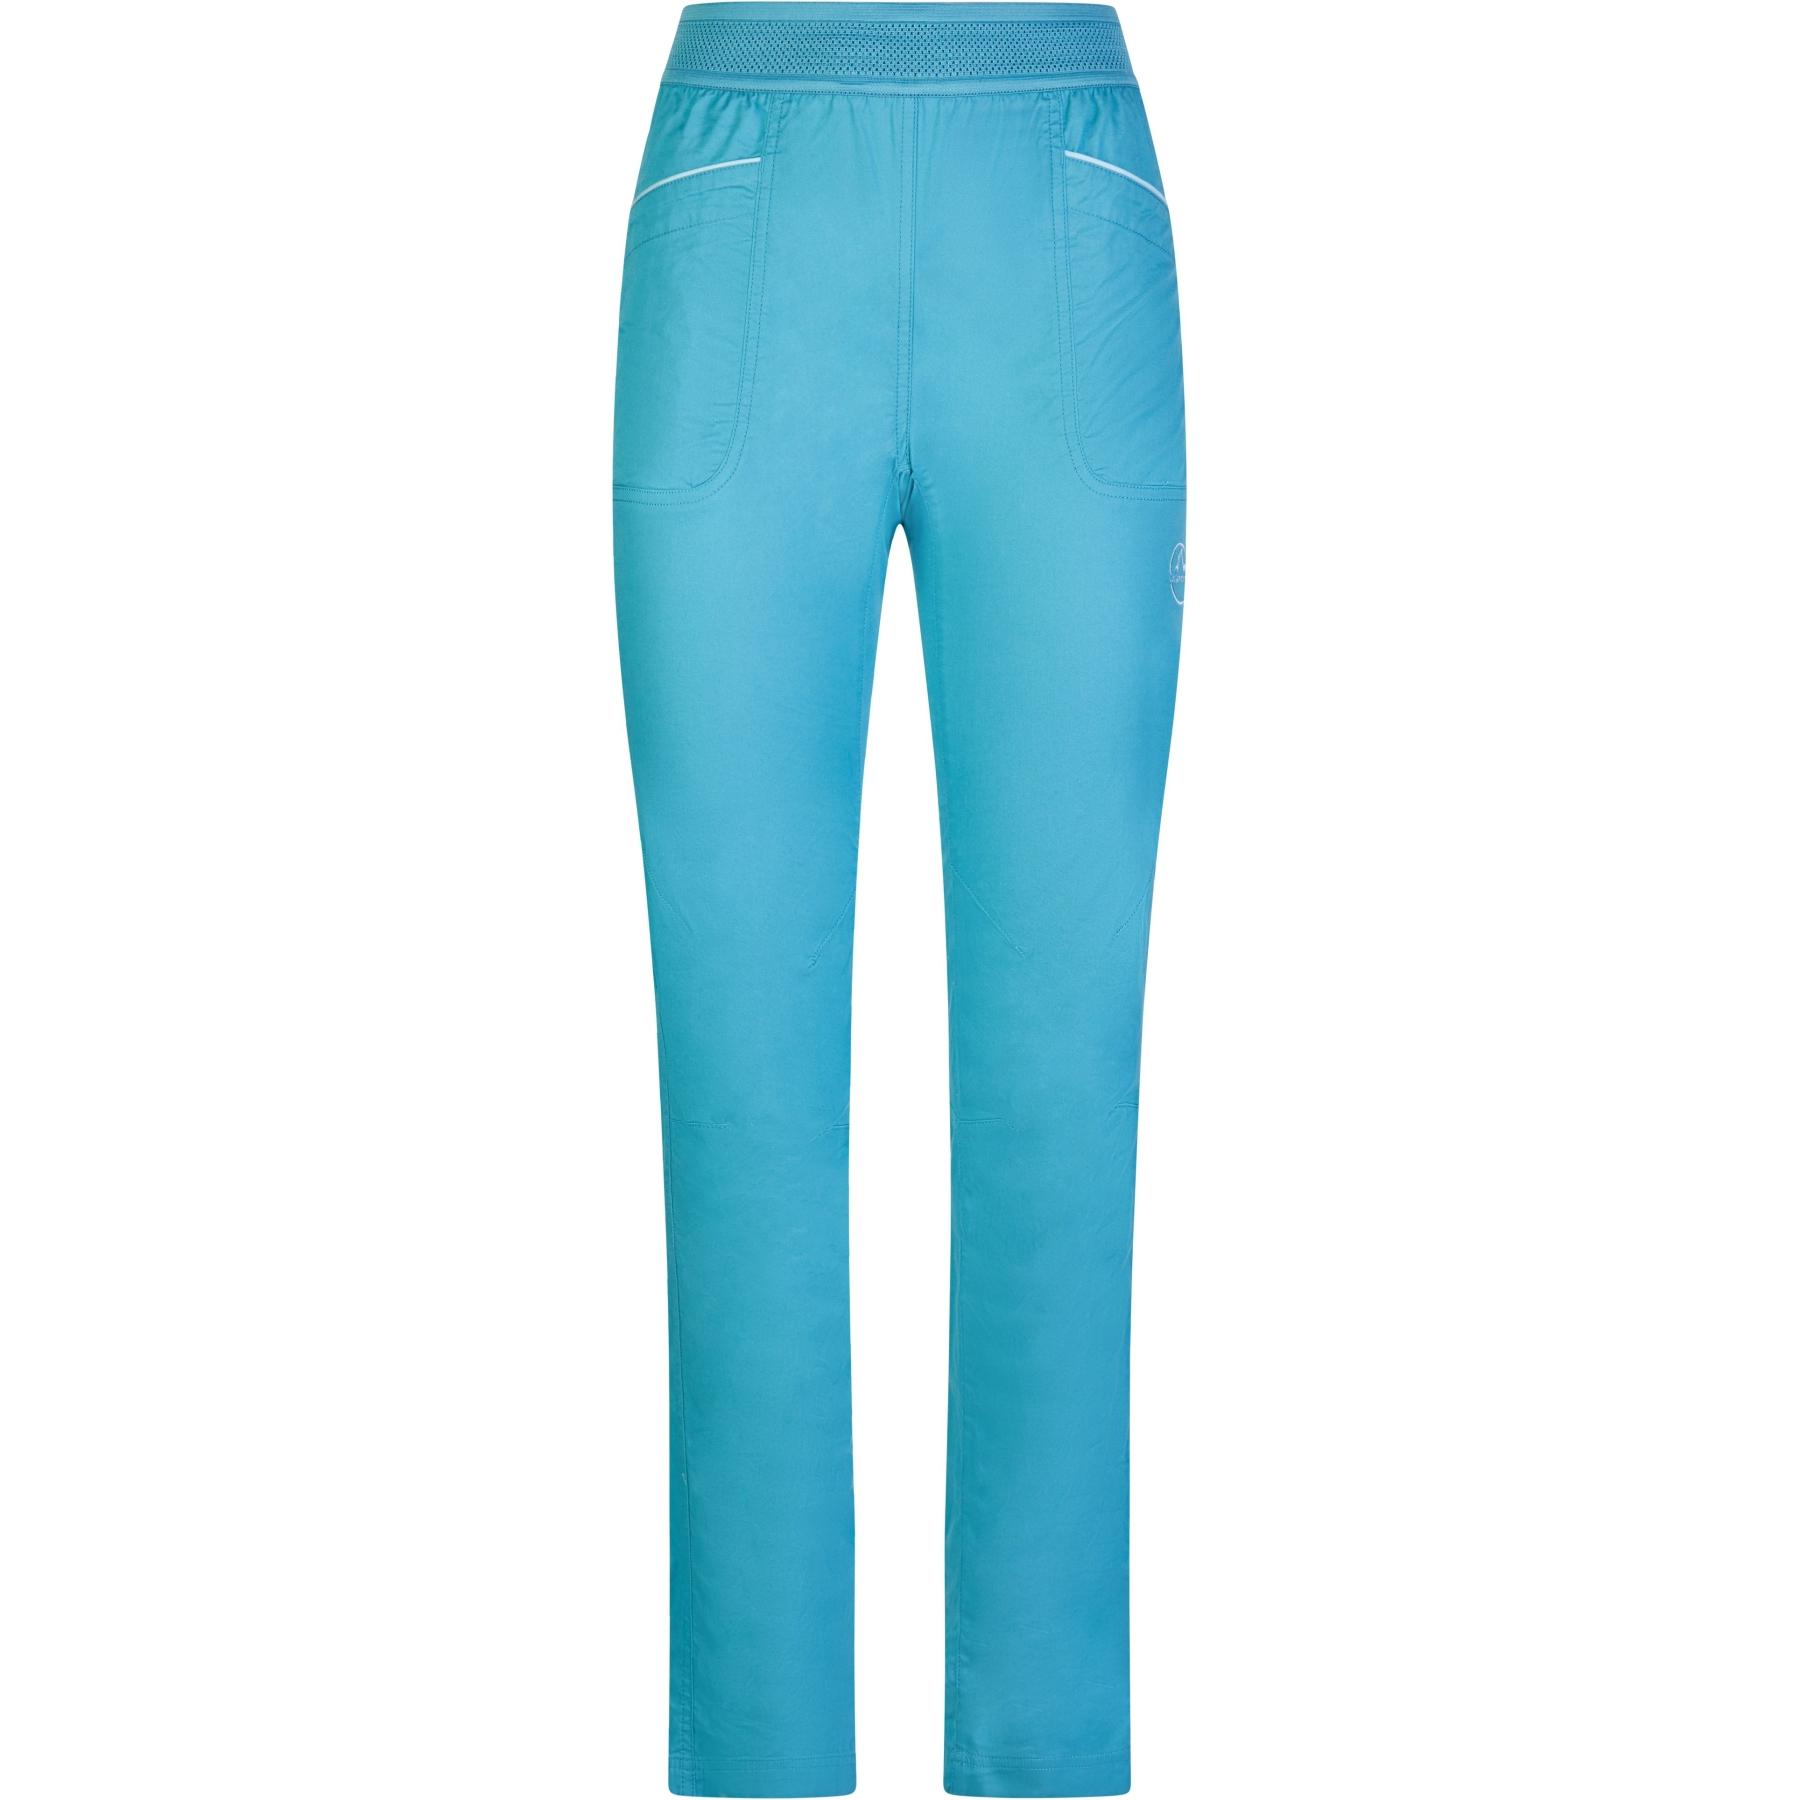 La Sportiva Itaca Hose Damen - Topaz/Celestial Blue